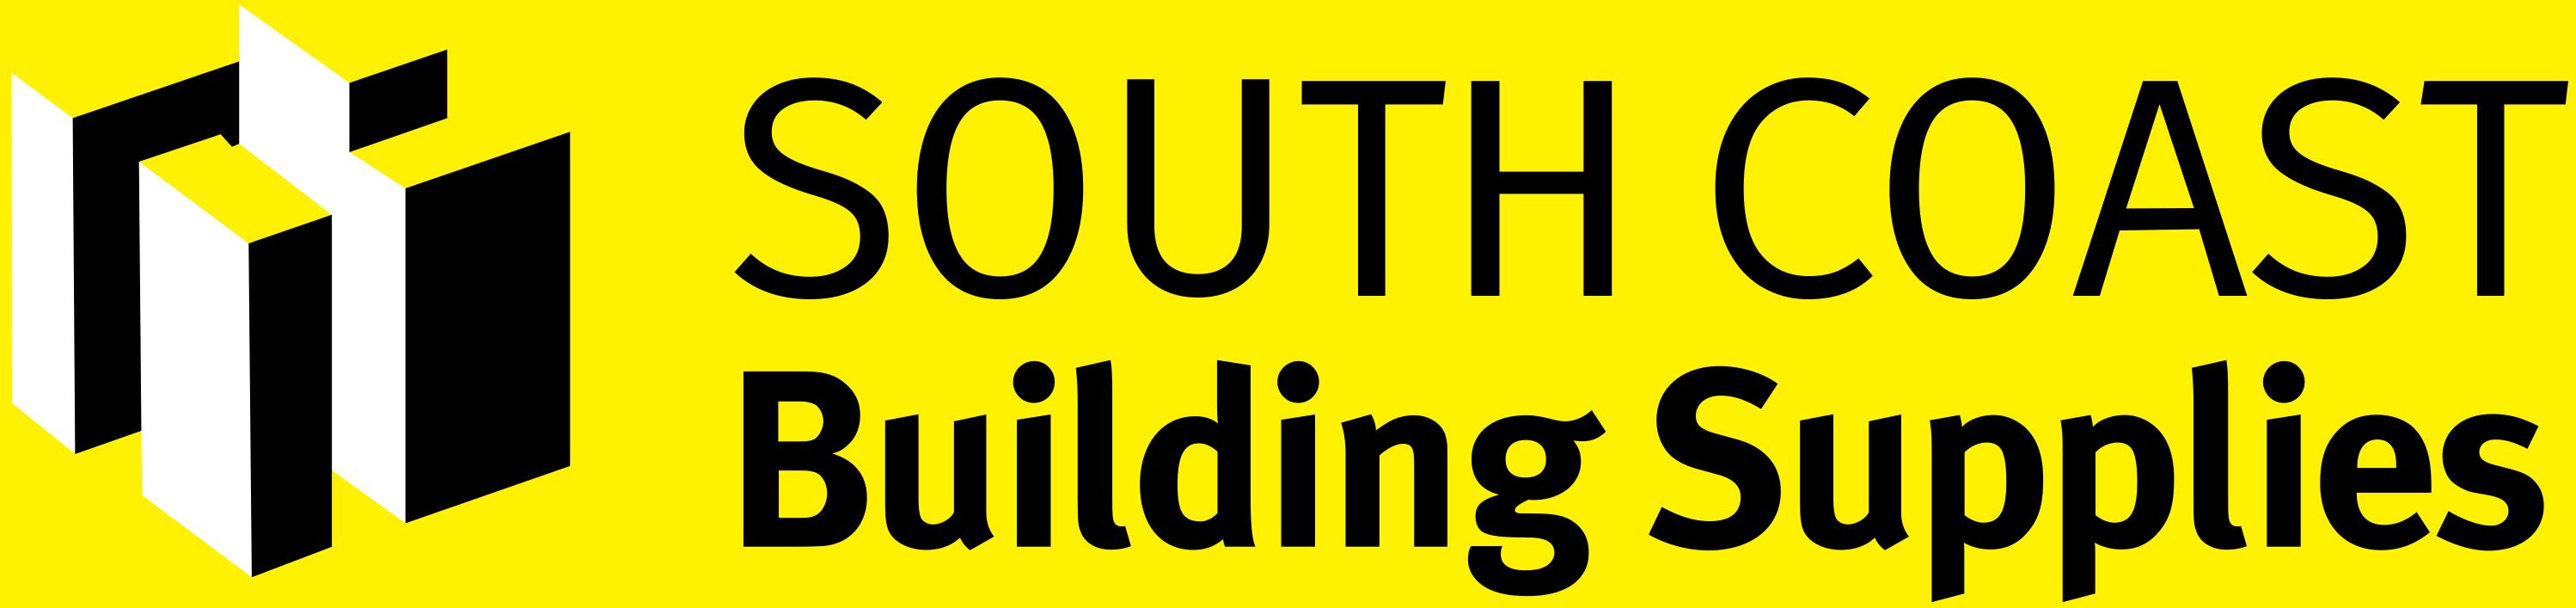 South Coast Building Supplies